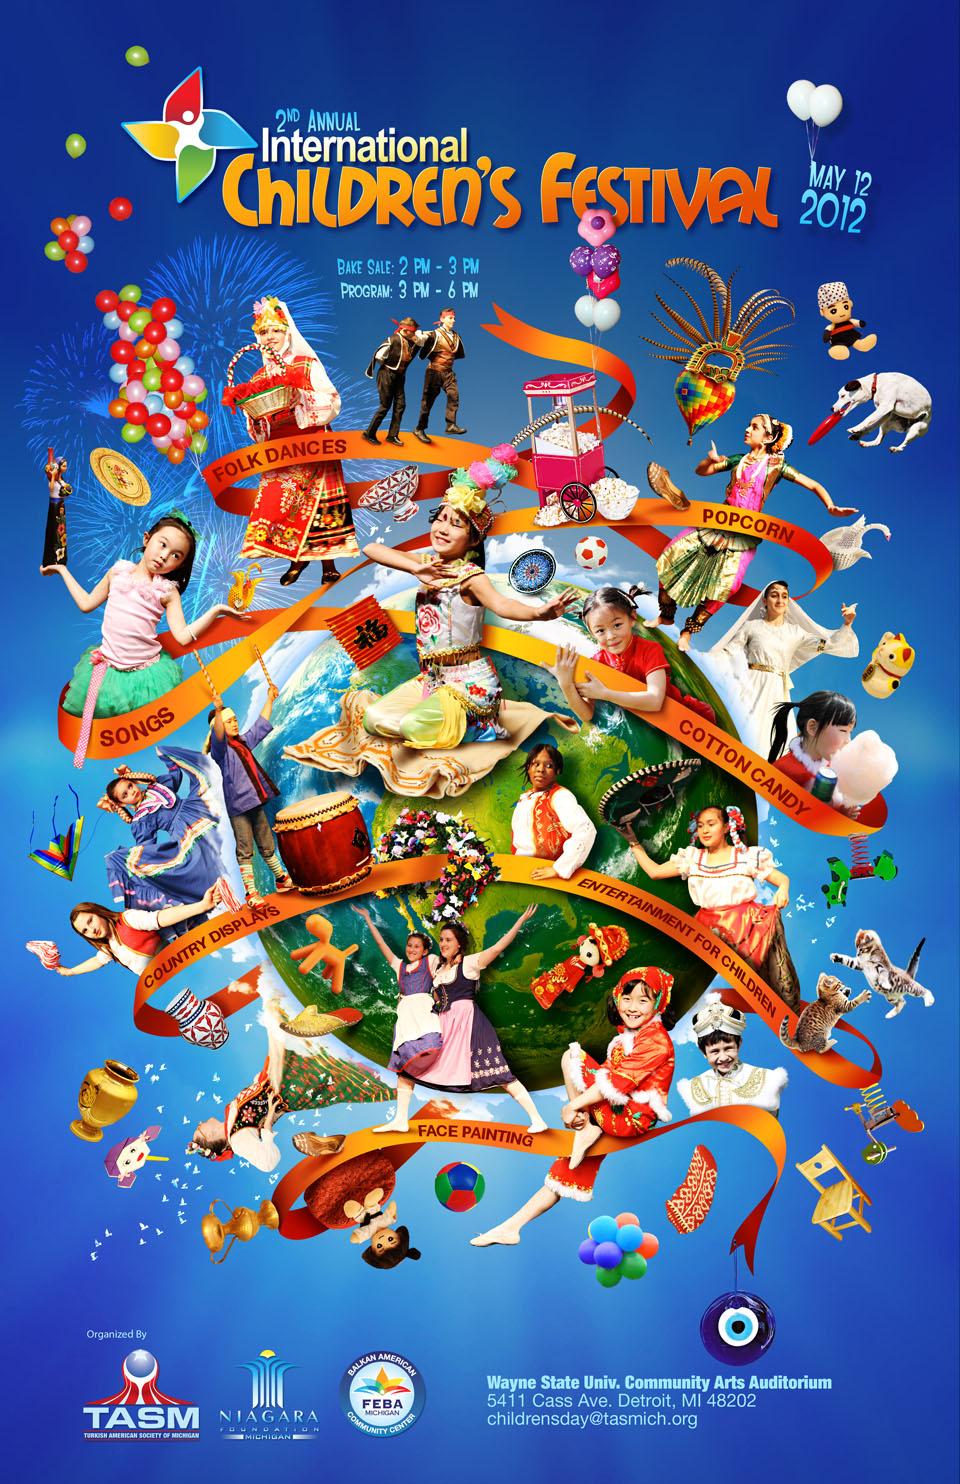 promo : The Second Annual International Children's Festival